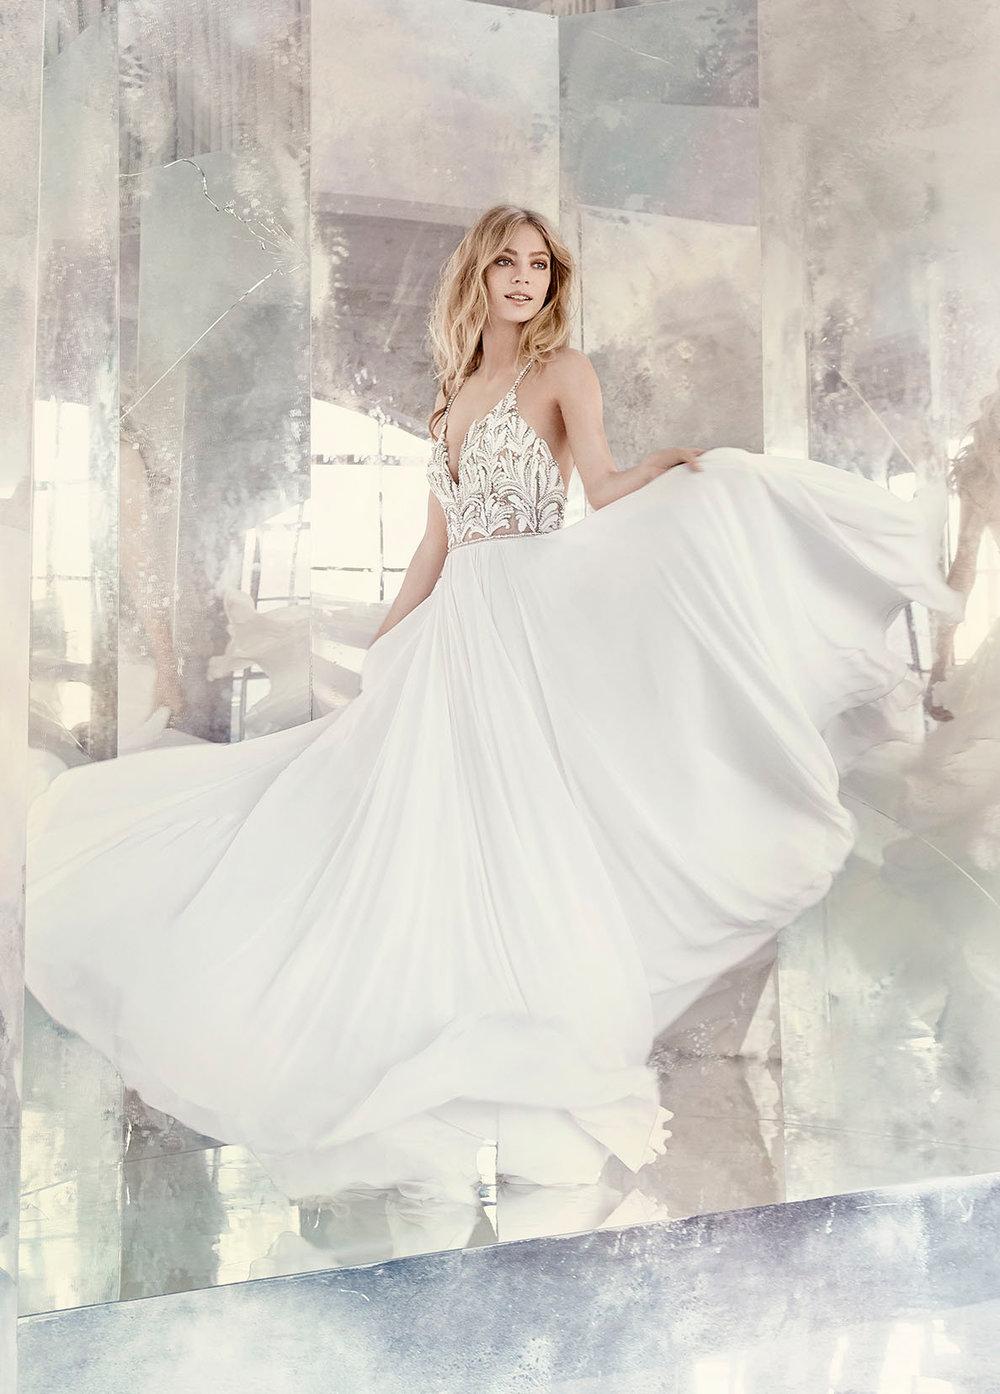 hayley-paige-bridal-chiffon-a-line-celestial-beaded-bodice-v-neckline-t-strap-back-full-circular-6609_lg.jpg